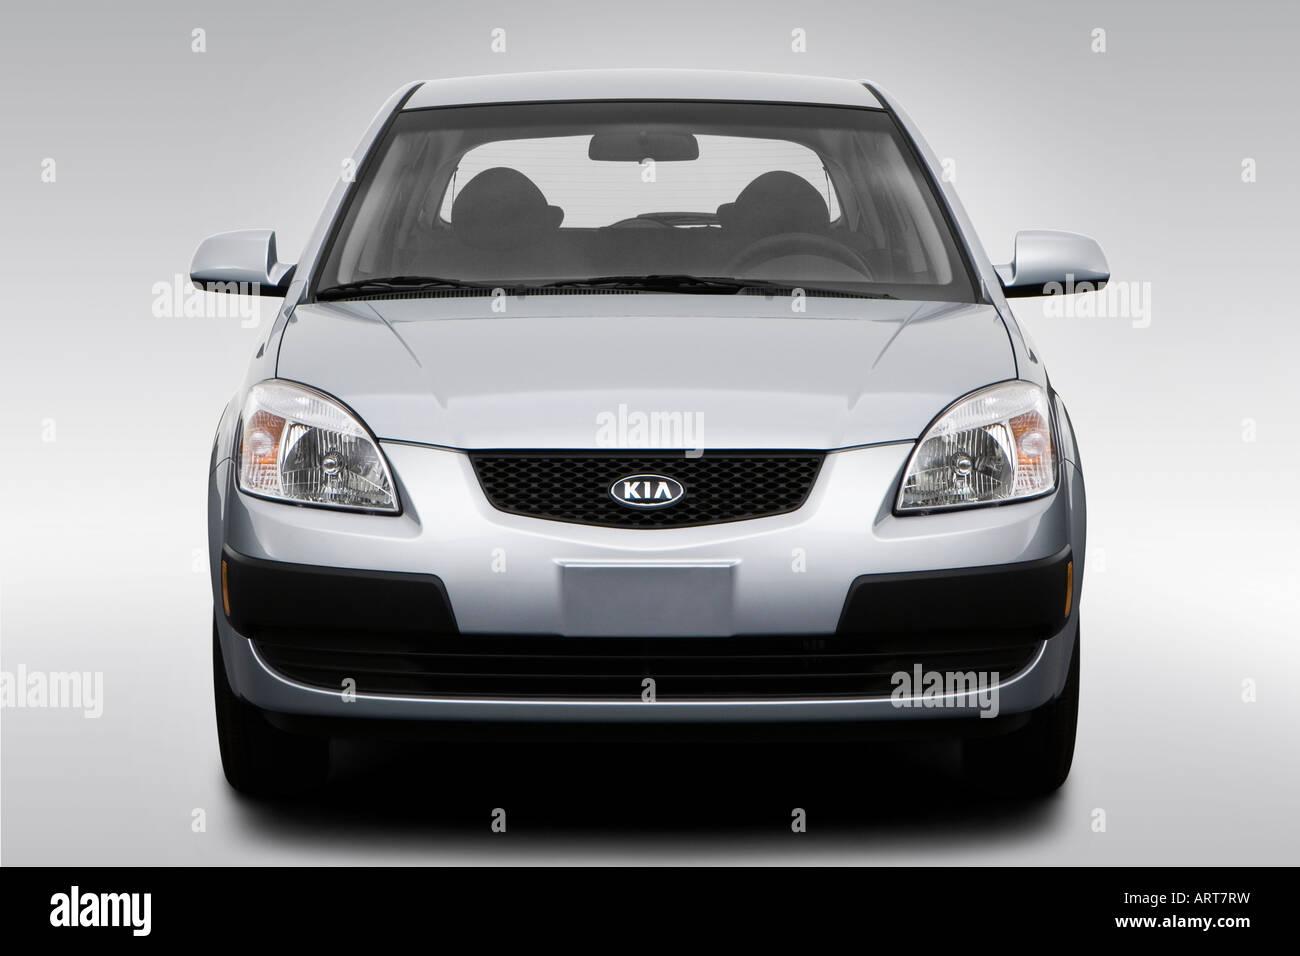 2008 Kia Rio 5 Lx In Silver Low Wide Front Stock Photo Alamy